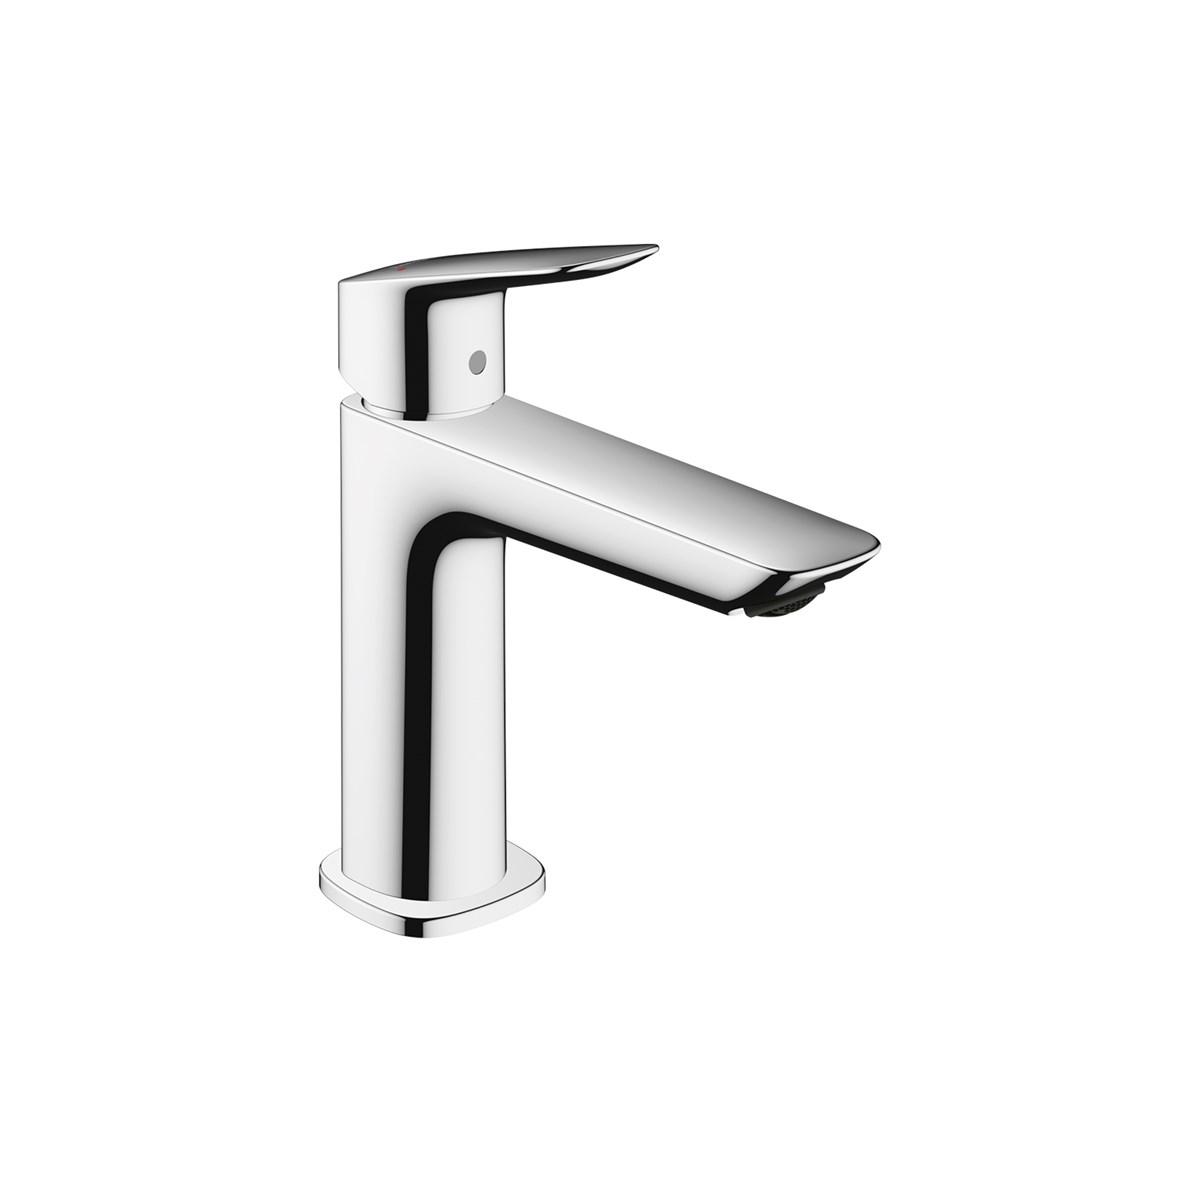 Hansgrohe-Logis-Fine-Basin-Mixer-110-71253000-Matisse-1